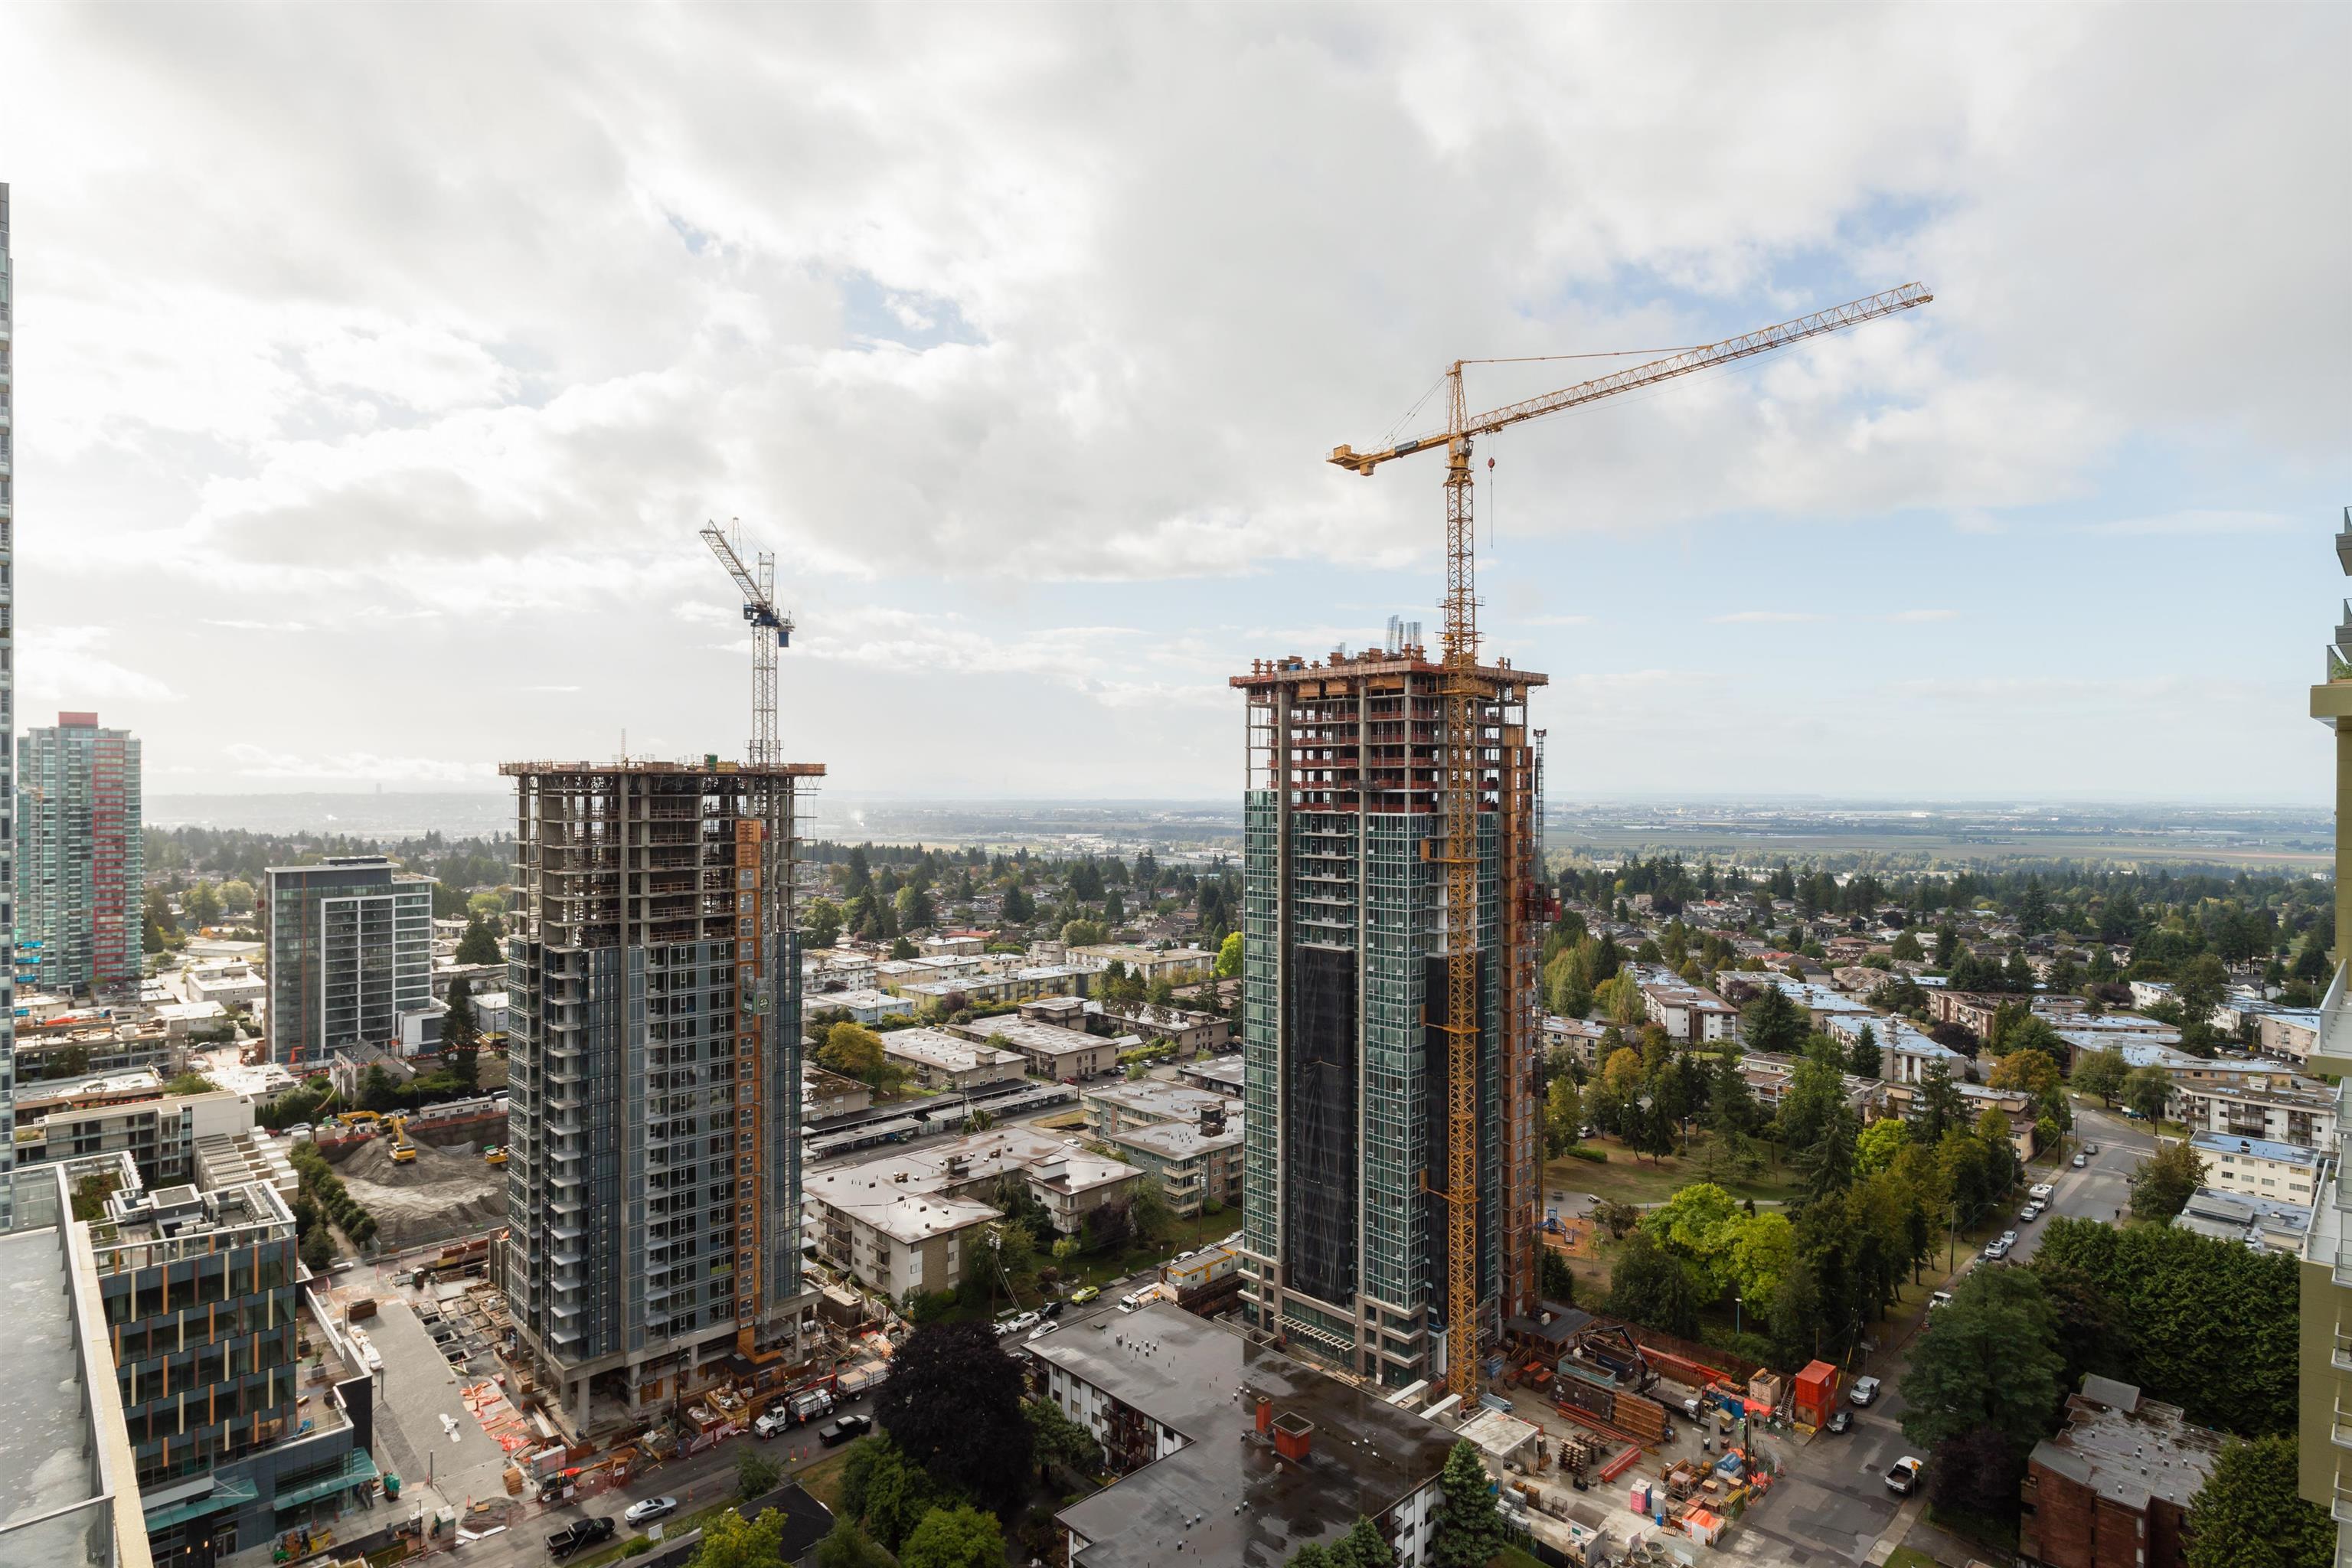 2206 6383 MCKAY AVENUE - Metrotown Apartment/Condo for sale, 2 Bedrooms (R2625647) - #29